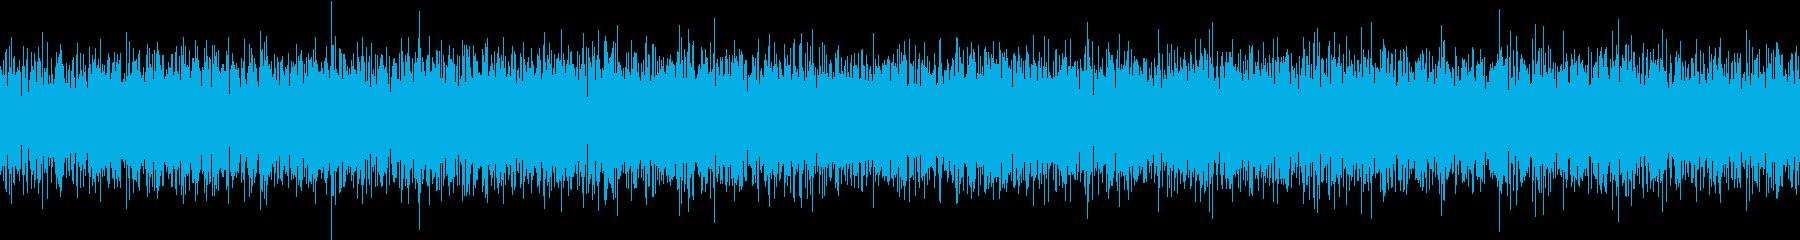 SunaArashi TVの砂嵐 4の再生済みの波形